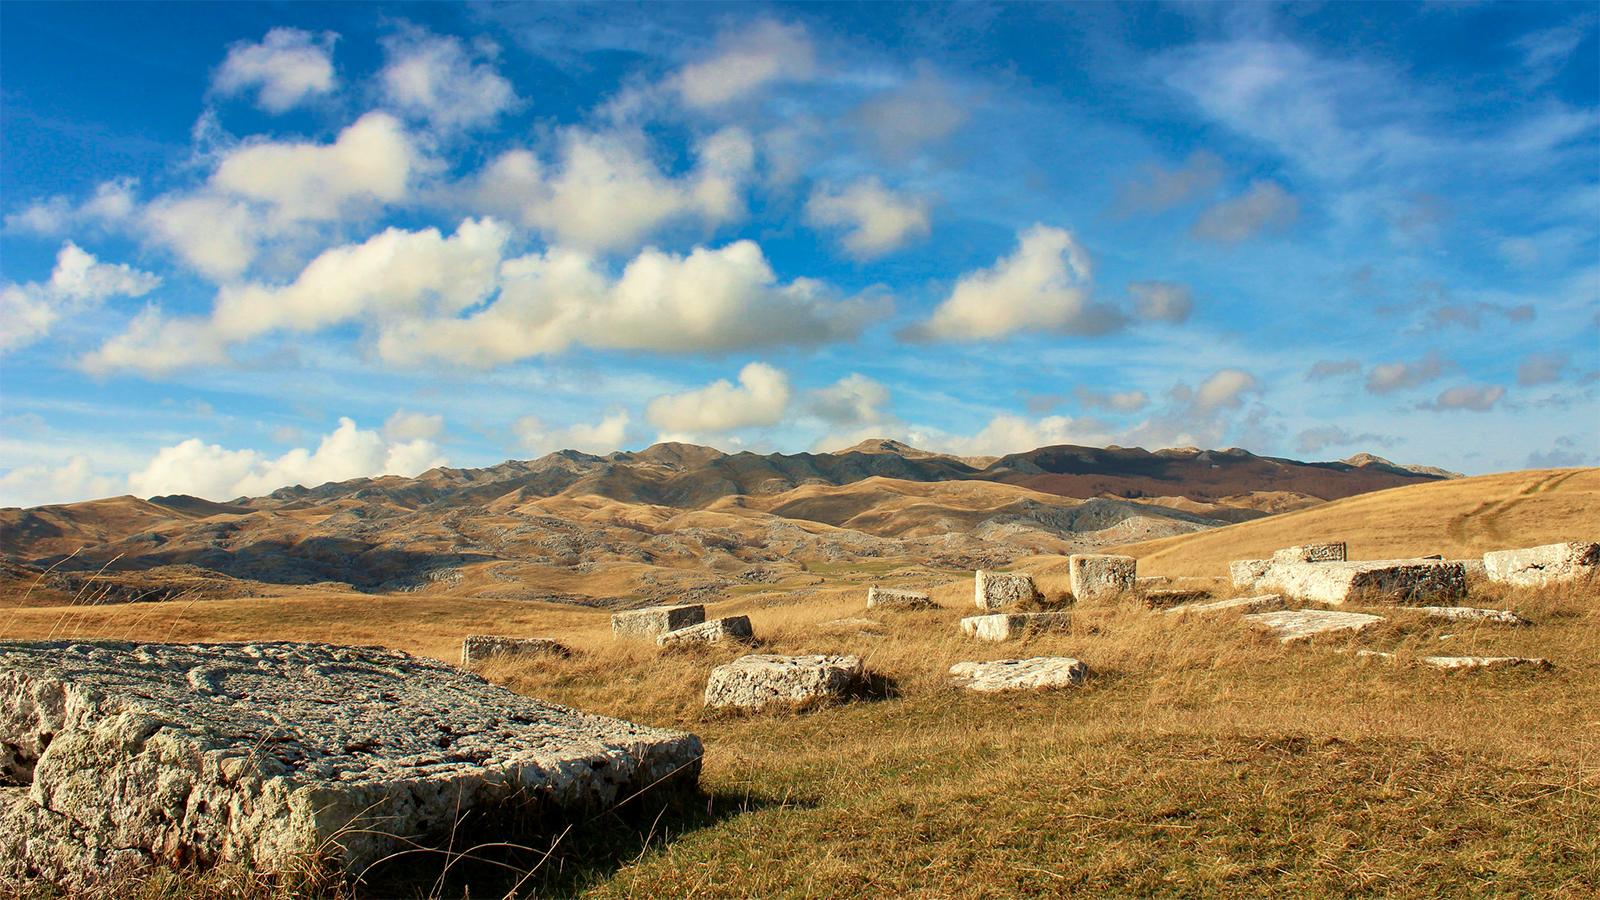 Des stećci de Bosnie-Herzégovine - © John Pruess